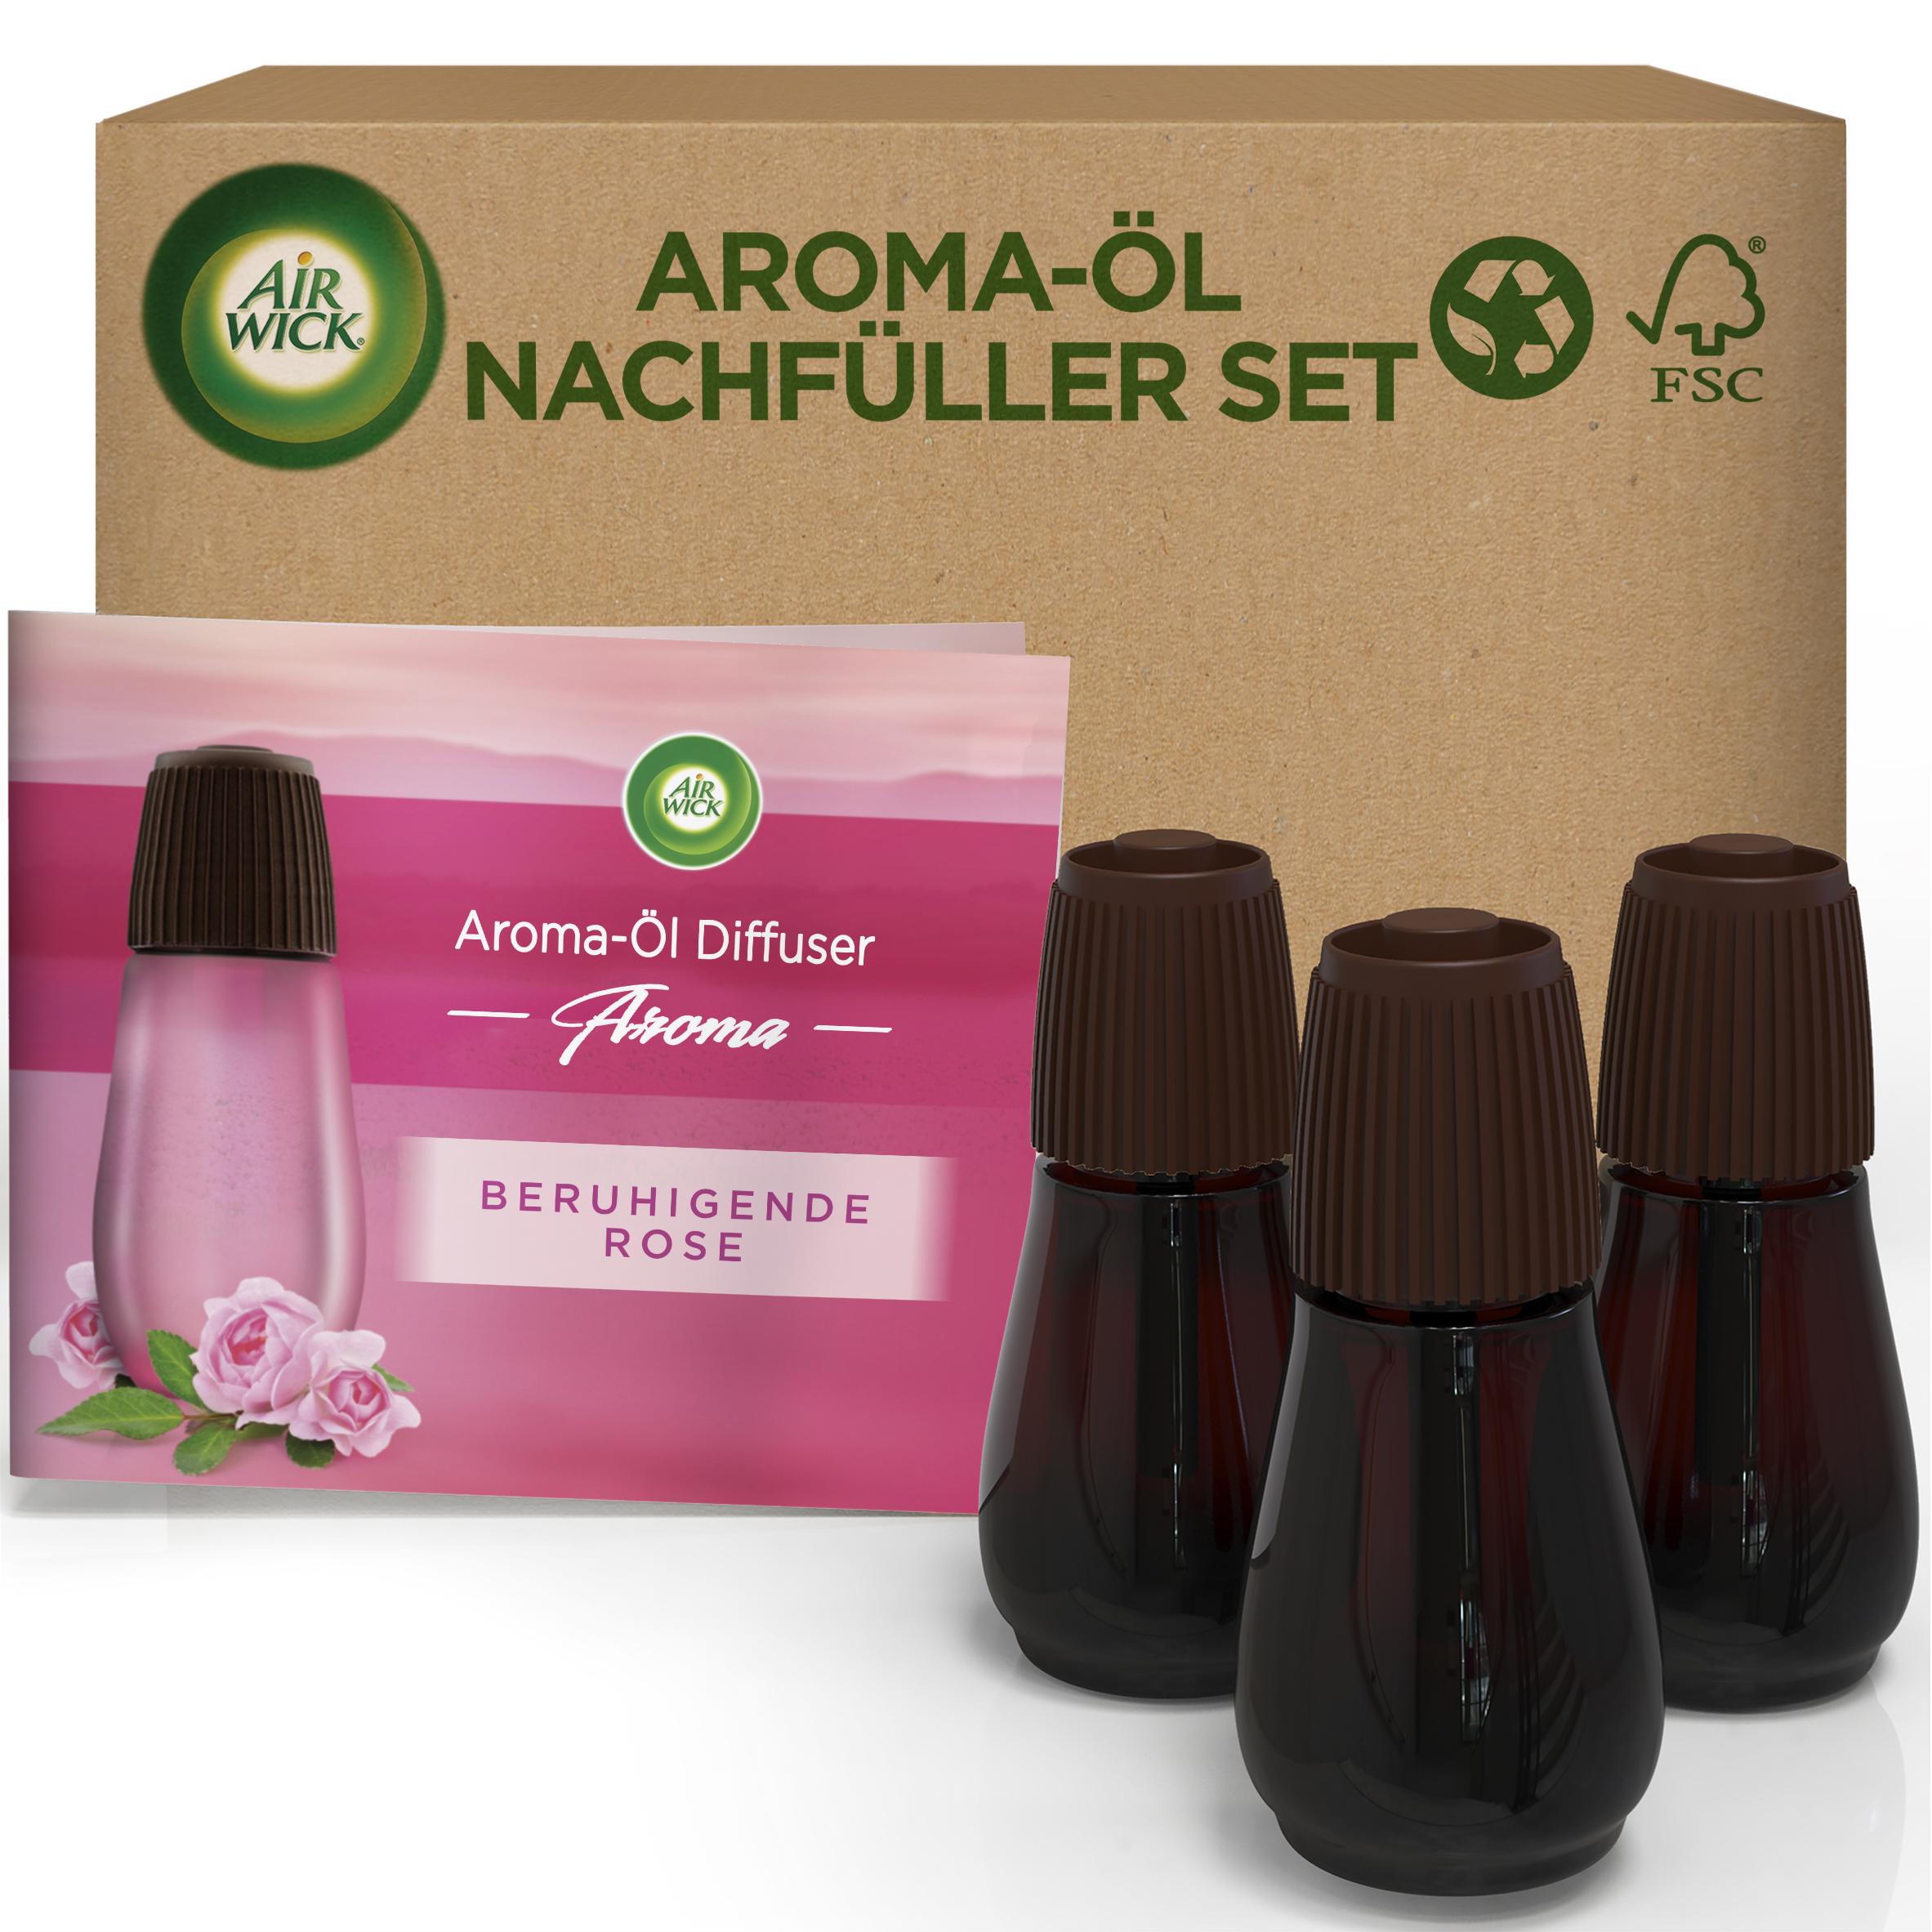 Air Wick Aroma-Öl Diffuser eCom Nachfüller-Set Beruhigende Rose